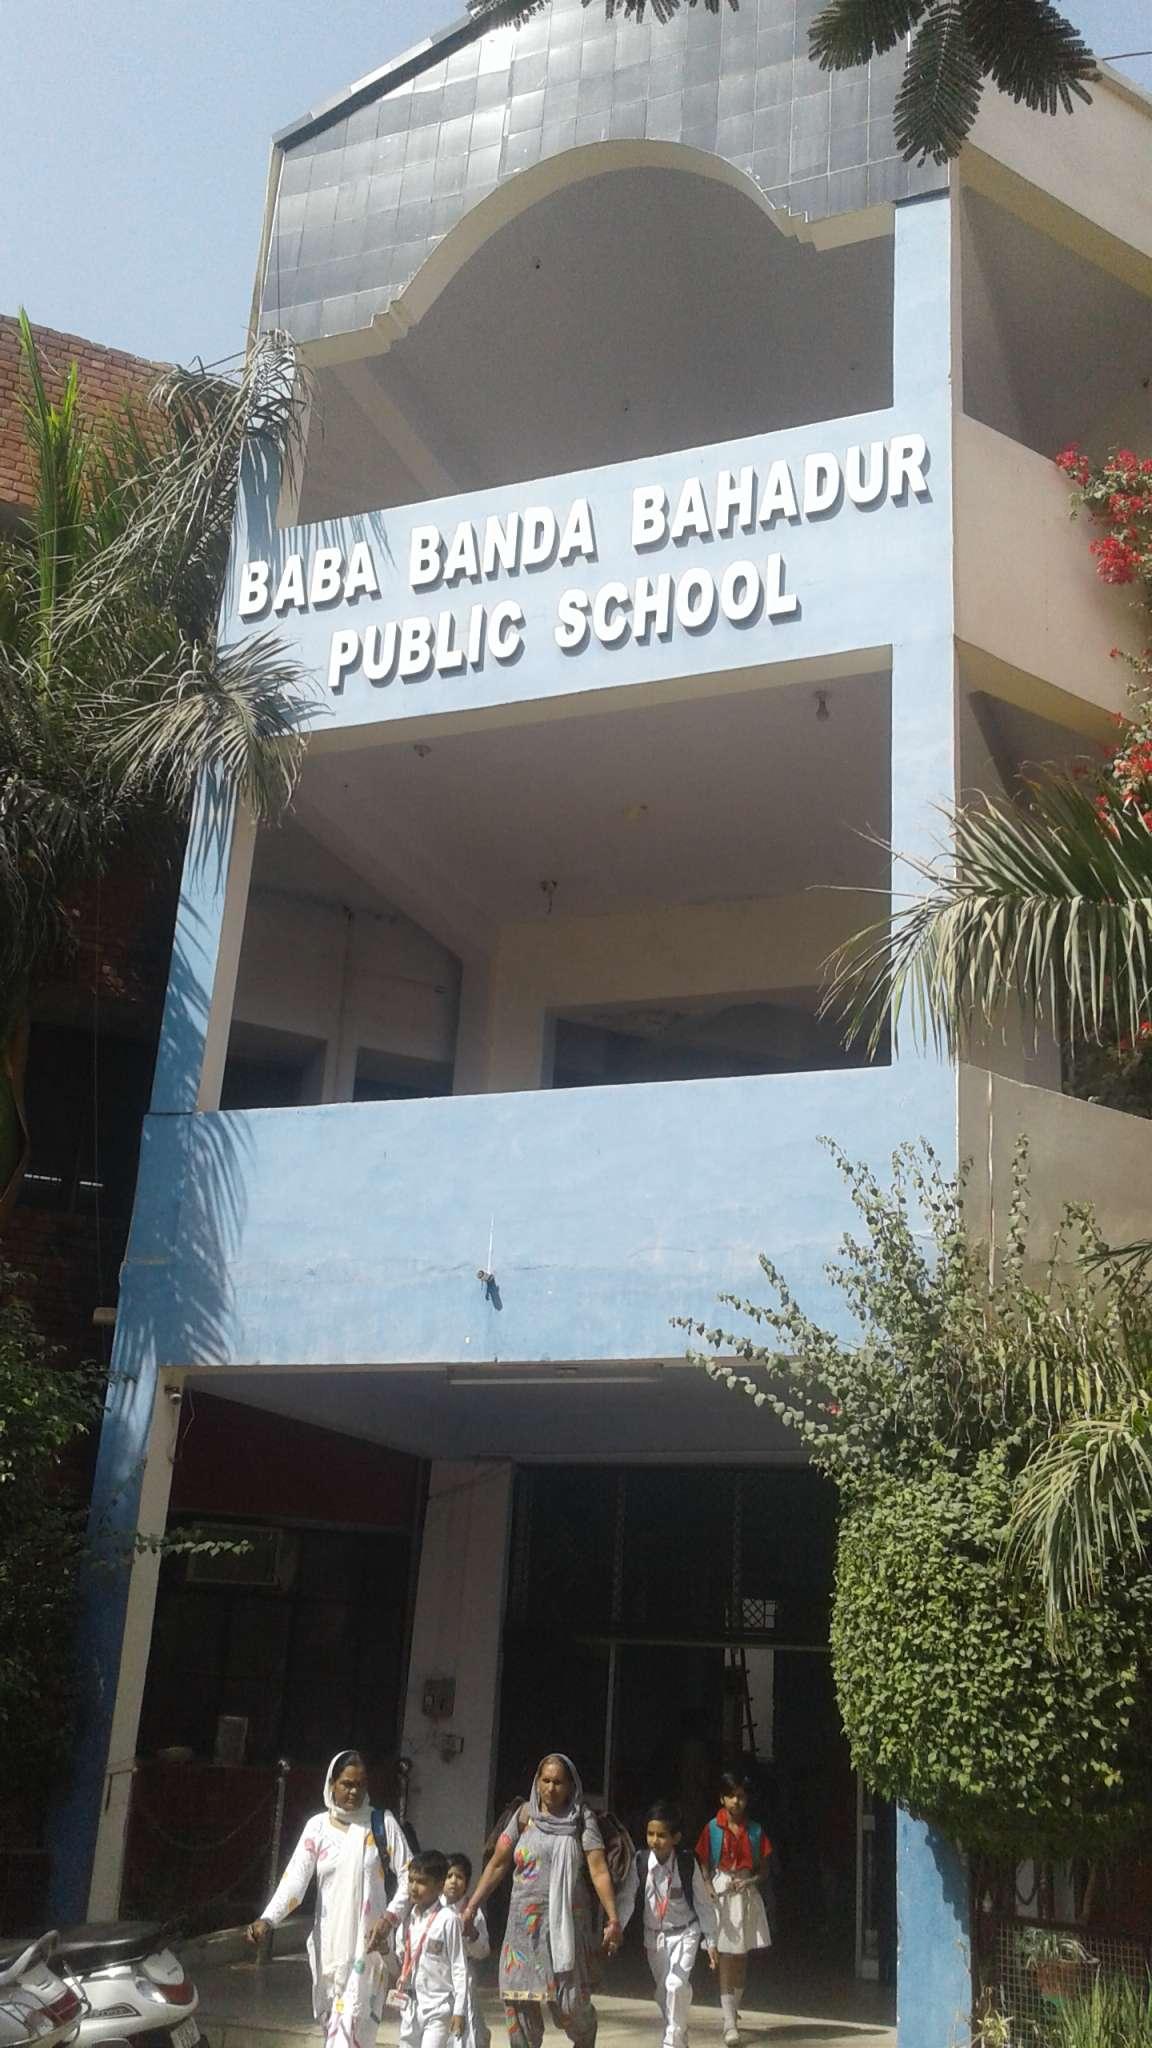 BABA BANDA BAHADUR PUBLIC SCHOOL HANSI TEHSIL ROAD HANSI HARYANA 530532